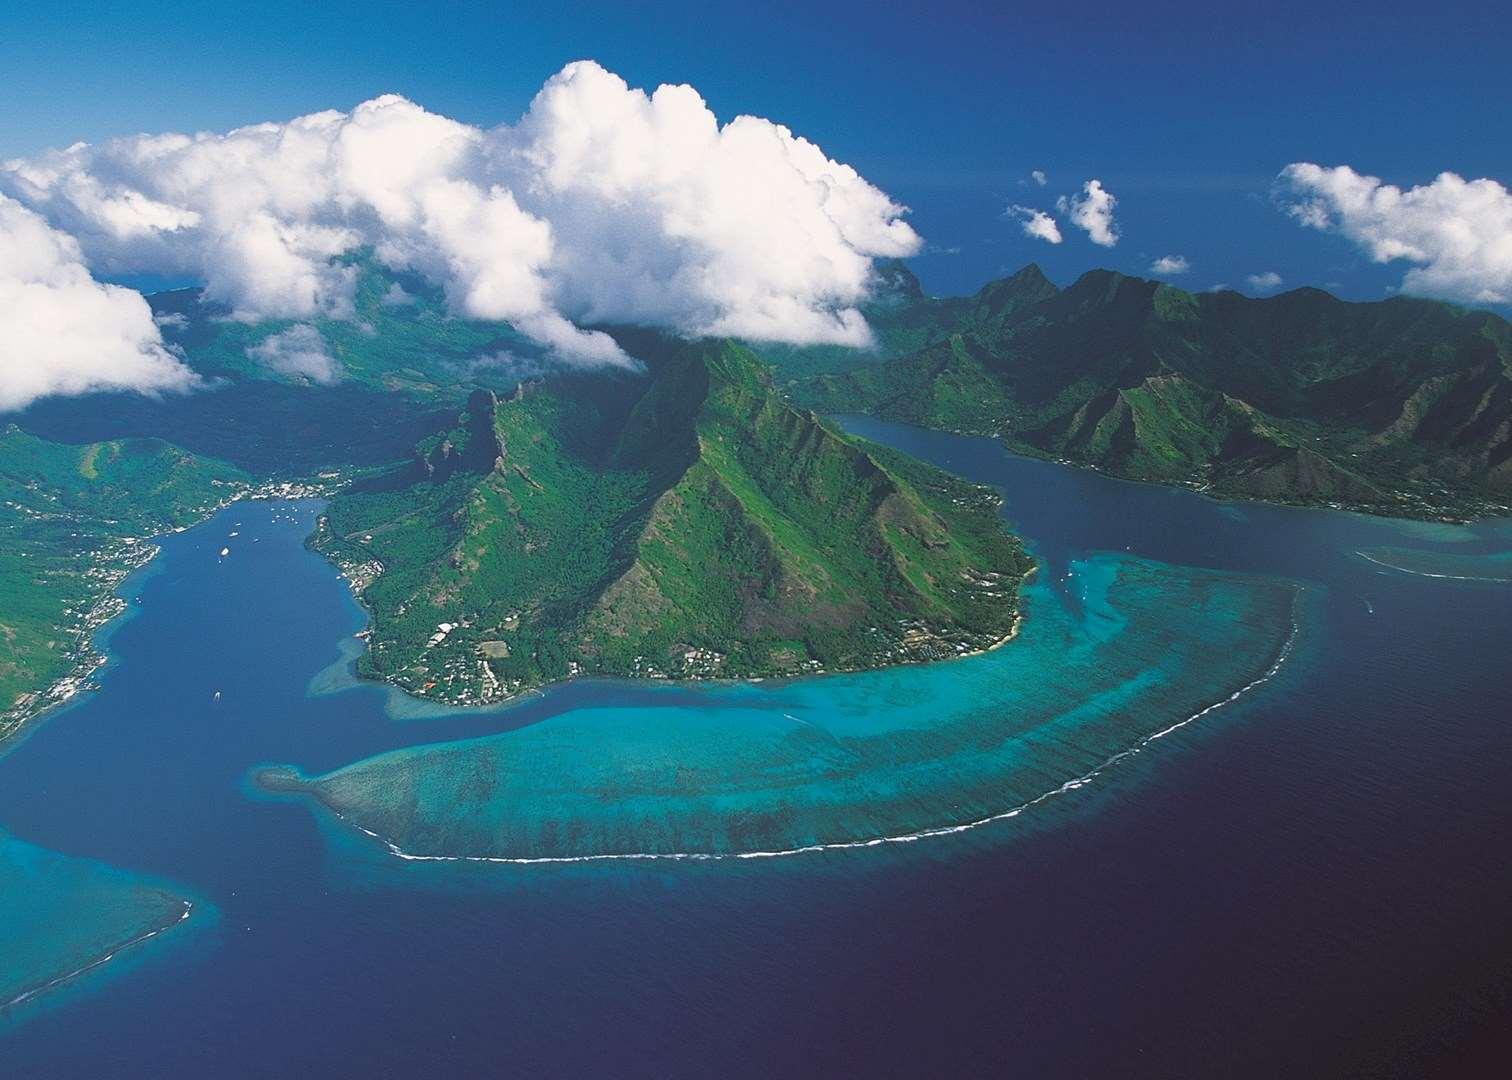 Fransk Polynesia Holidays - Holidays TIL Fransk Polynesia 2015